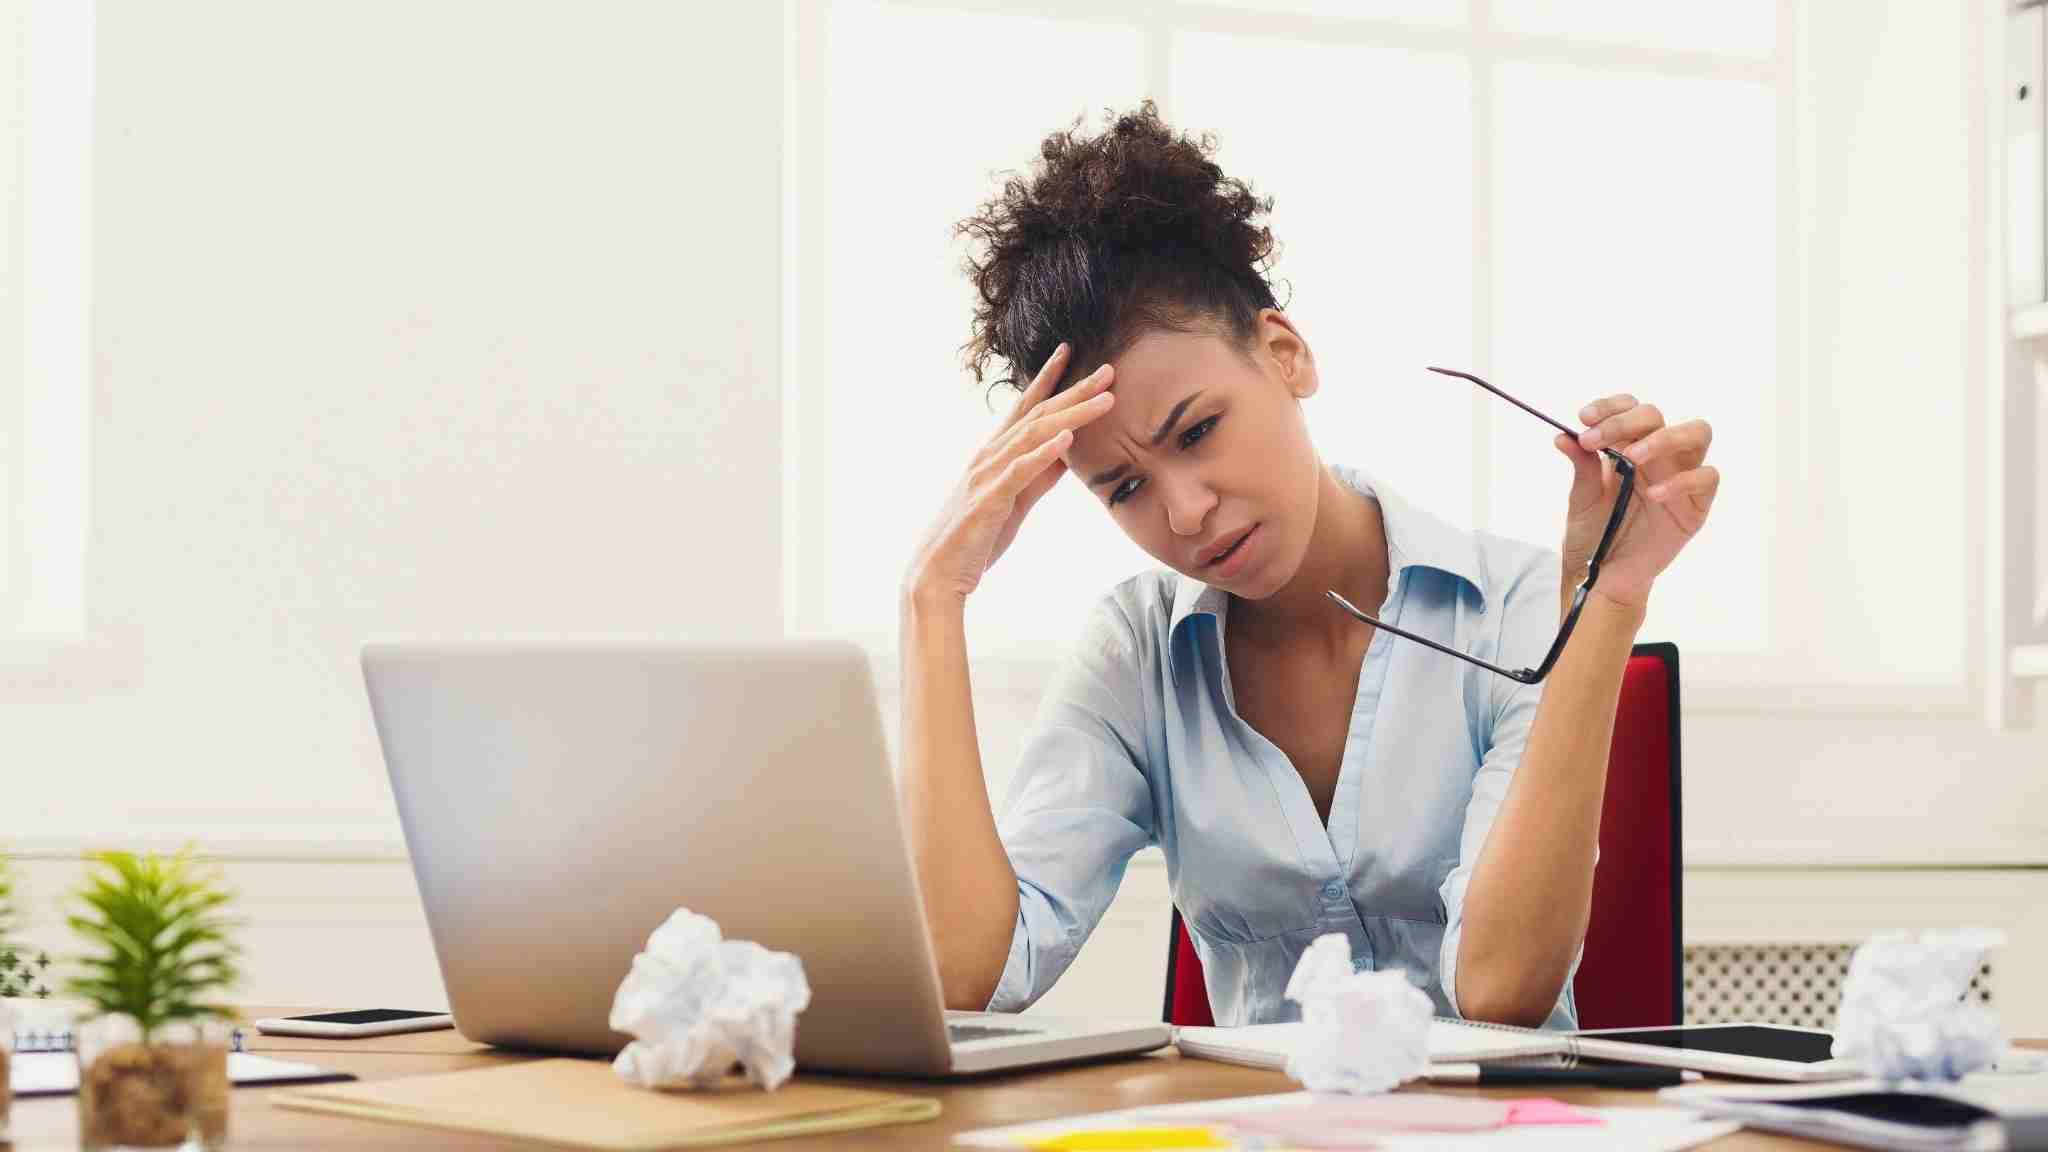 stress diaframma mal di schiena